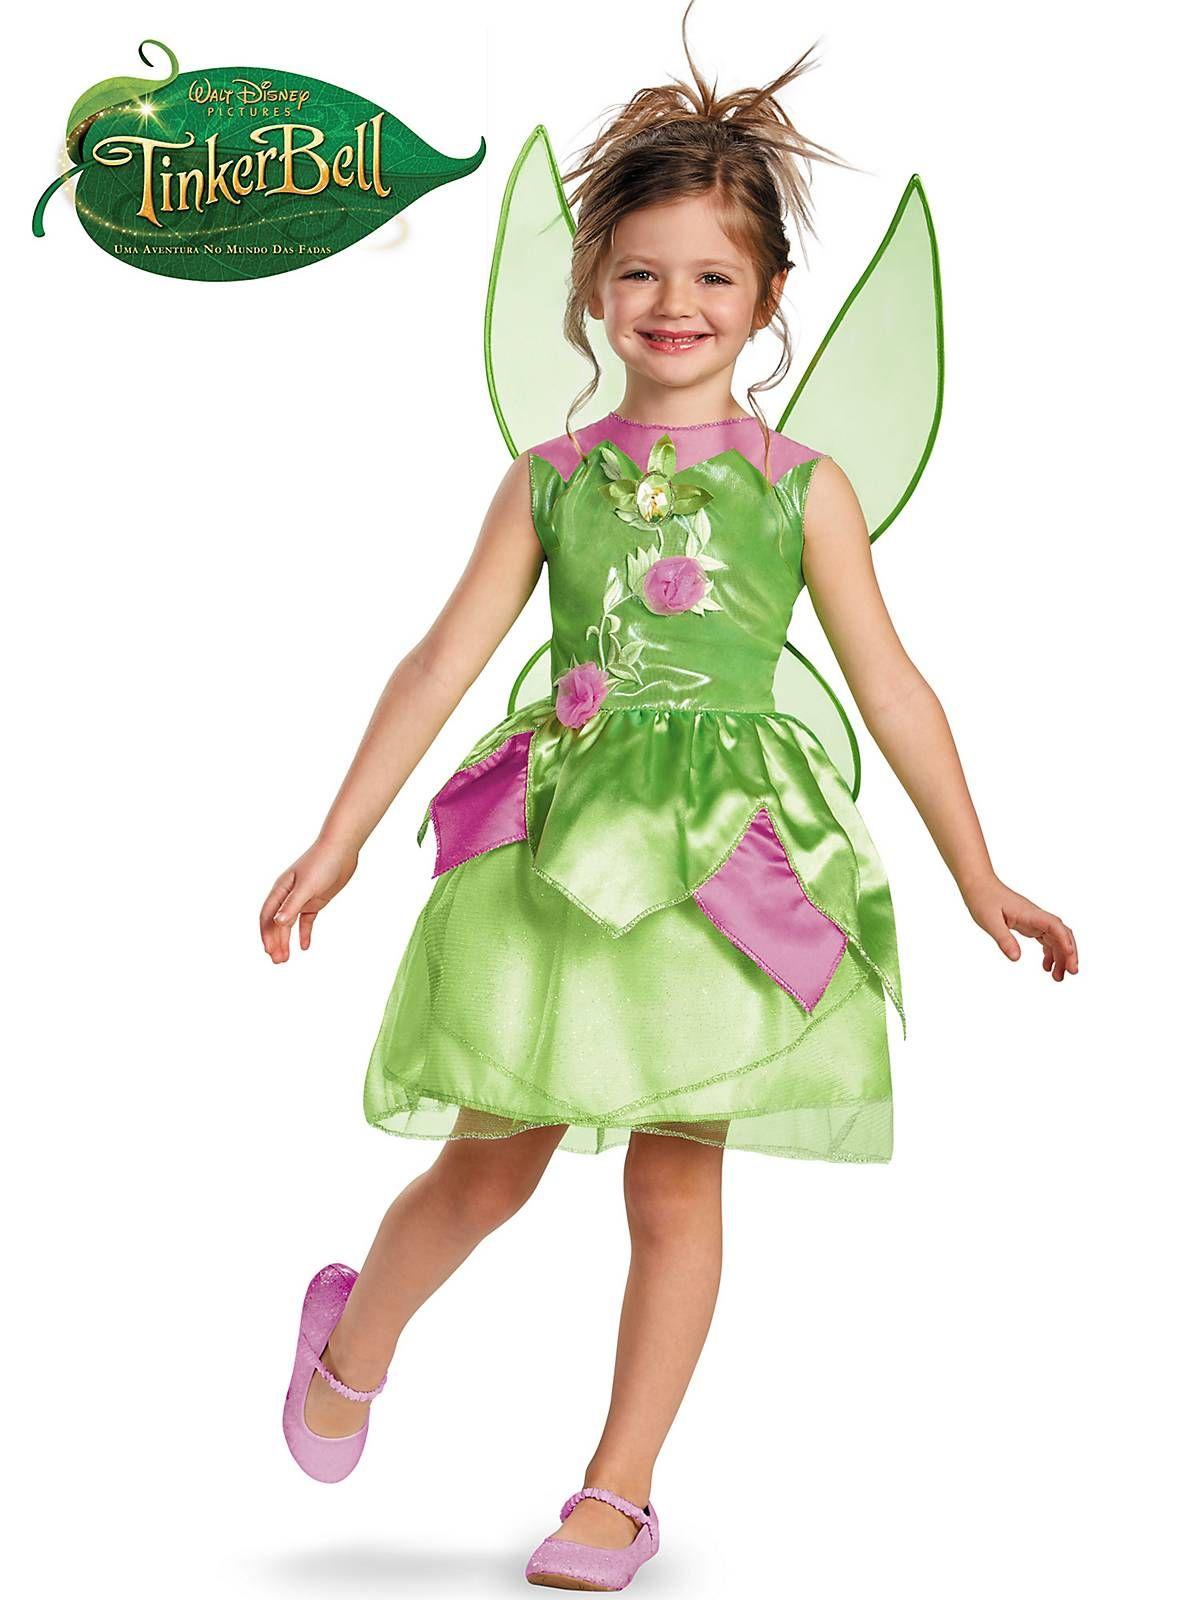 Toddler Tinkerbell Costume | Girls Disney Halloween Costumes  sc 1 st  Pinterest & Toddler Tinker Bell Classic Costume | Pinterest | Disney halloween ...